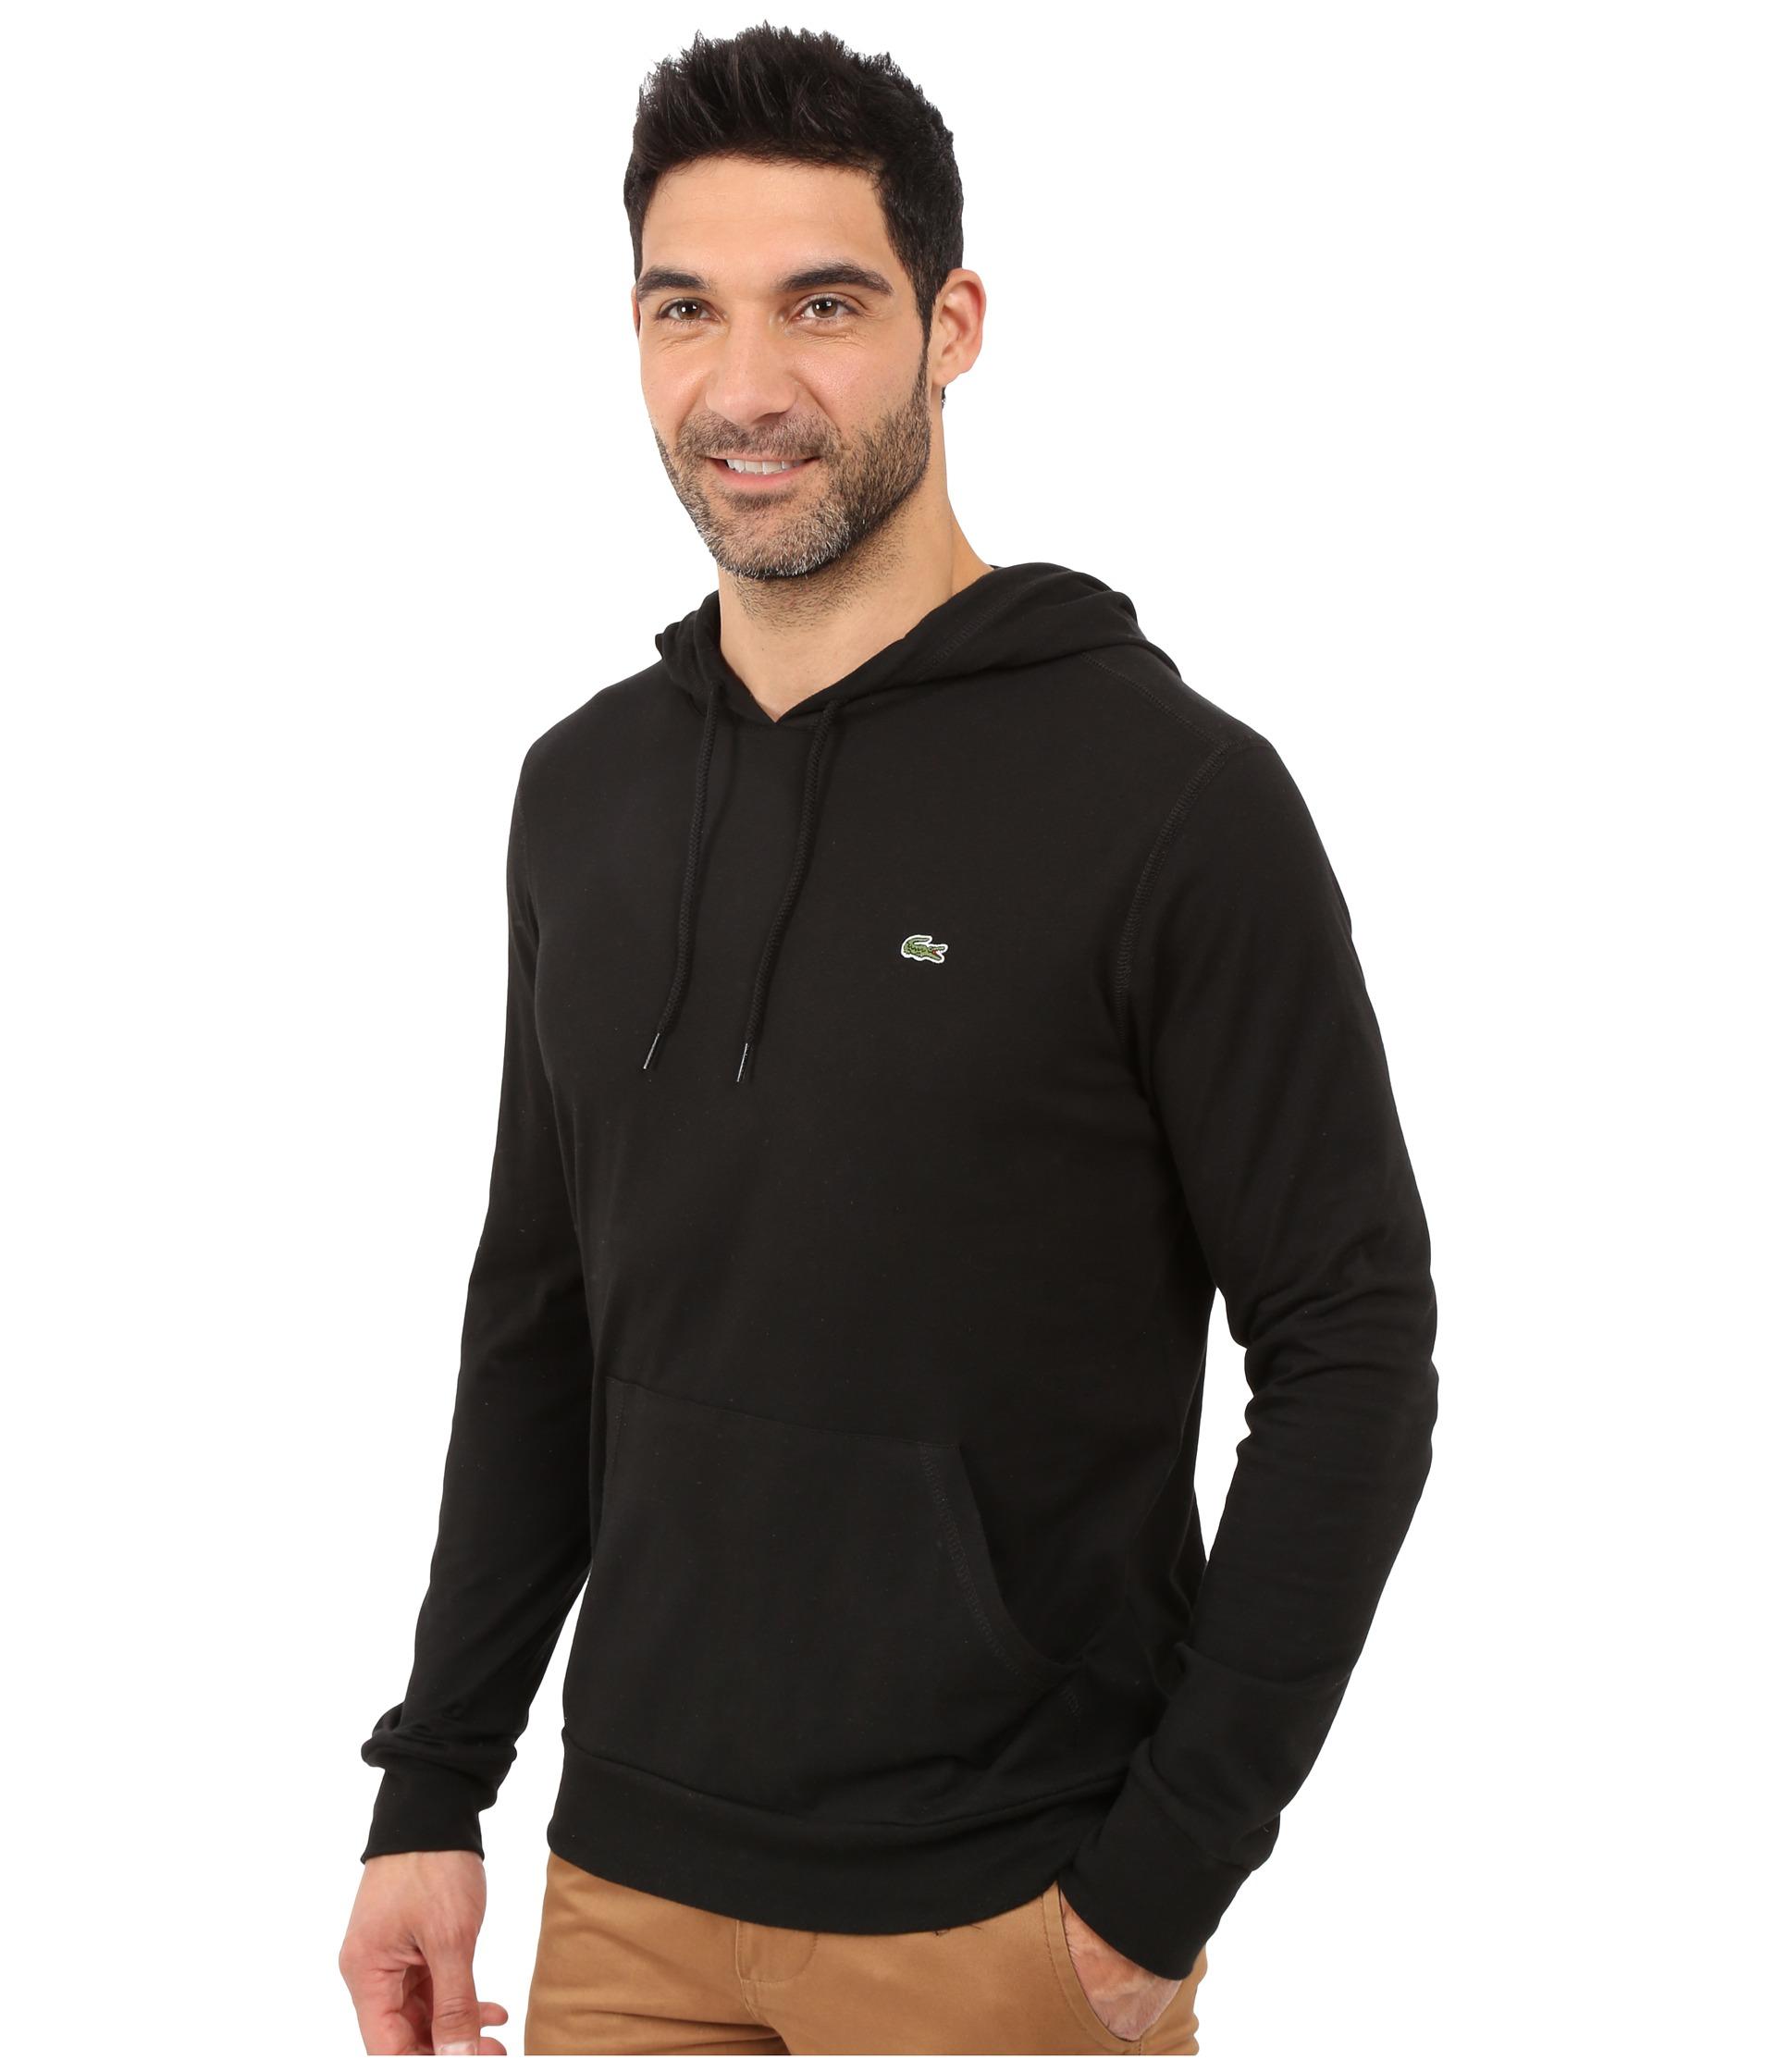 Black t shirt hoodie - Lacoste Jersey T Shirt Hoodie